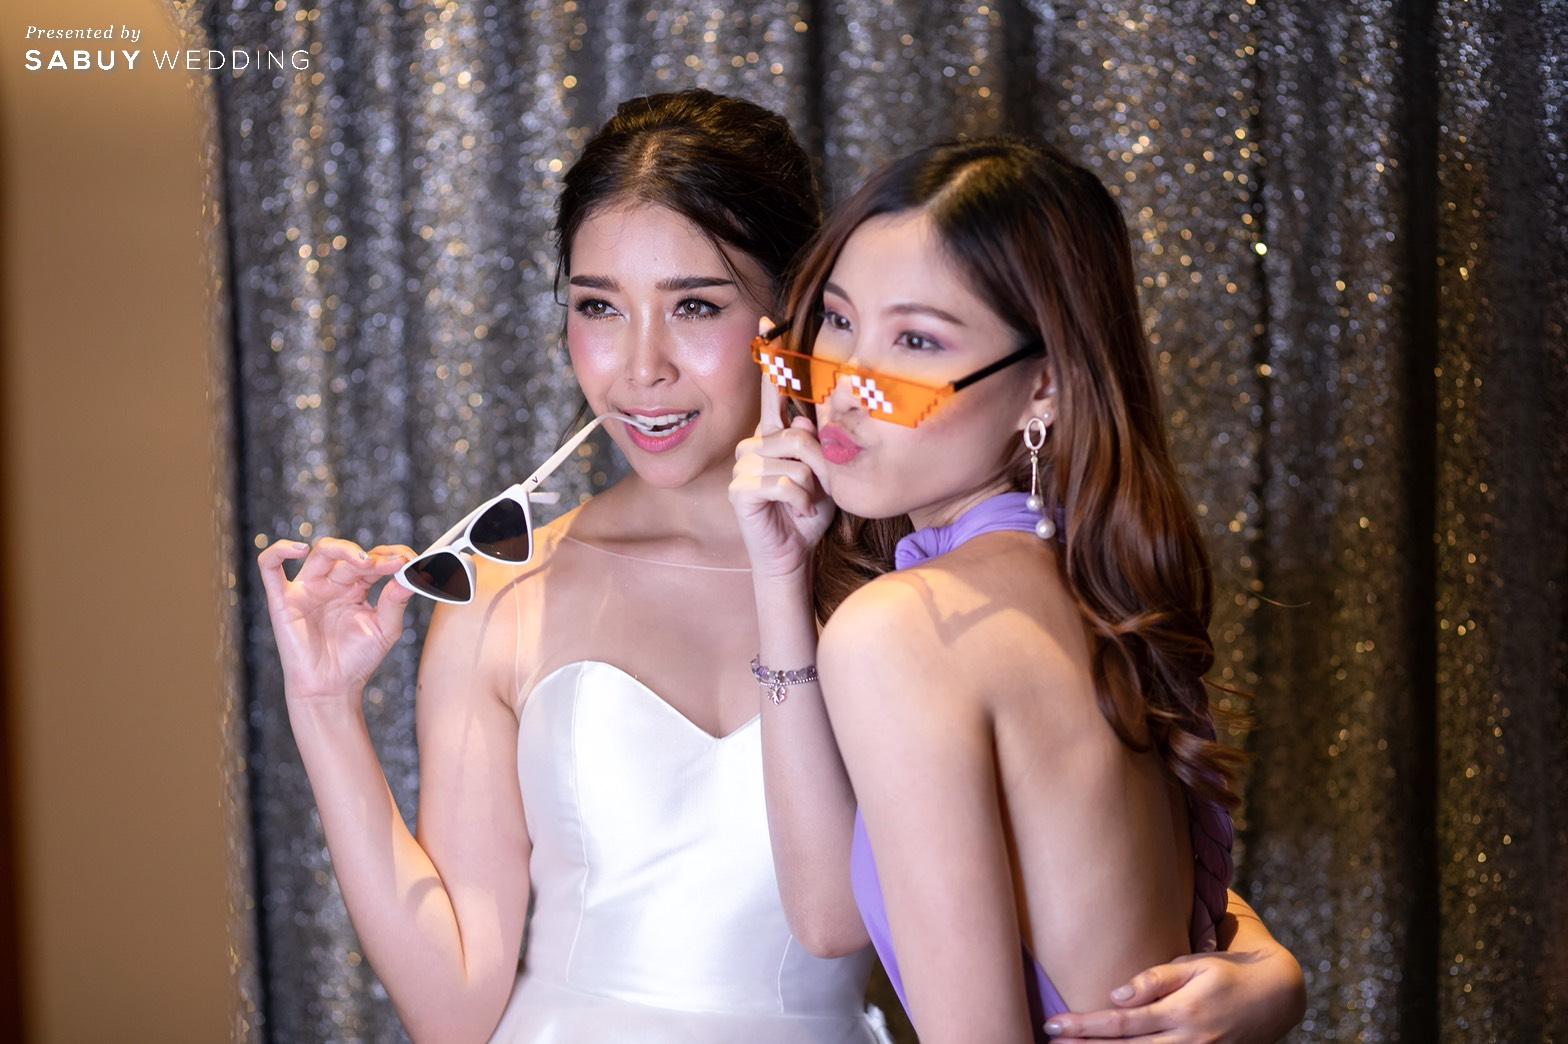 photobooth,ชุดเจ้าสาว,ชุดเพื่อนเจ้าสาว รีวิวงานแต่ง Minimal in Lavender เก๋ไม่ซ้ำใครสไตล์ Go Green @ SO/BANGKOK